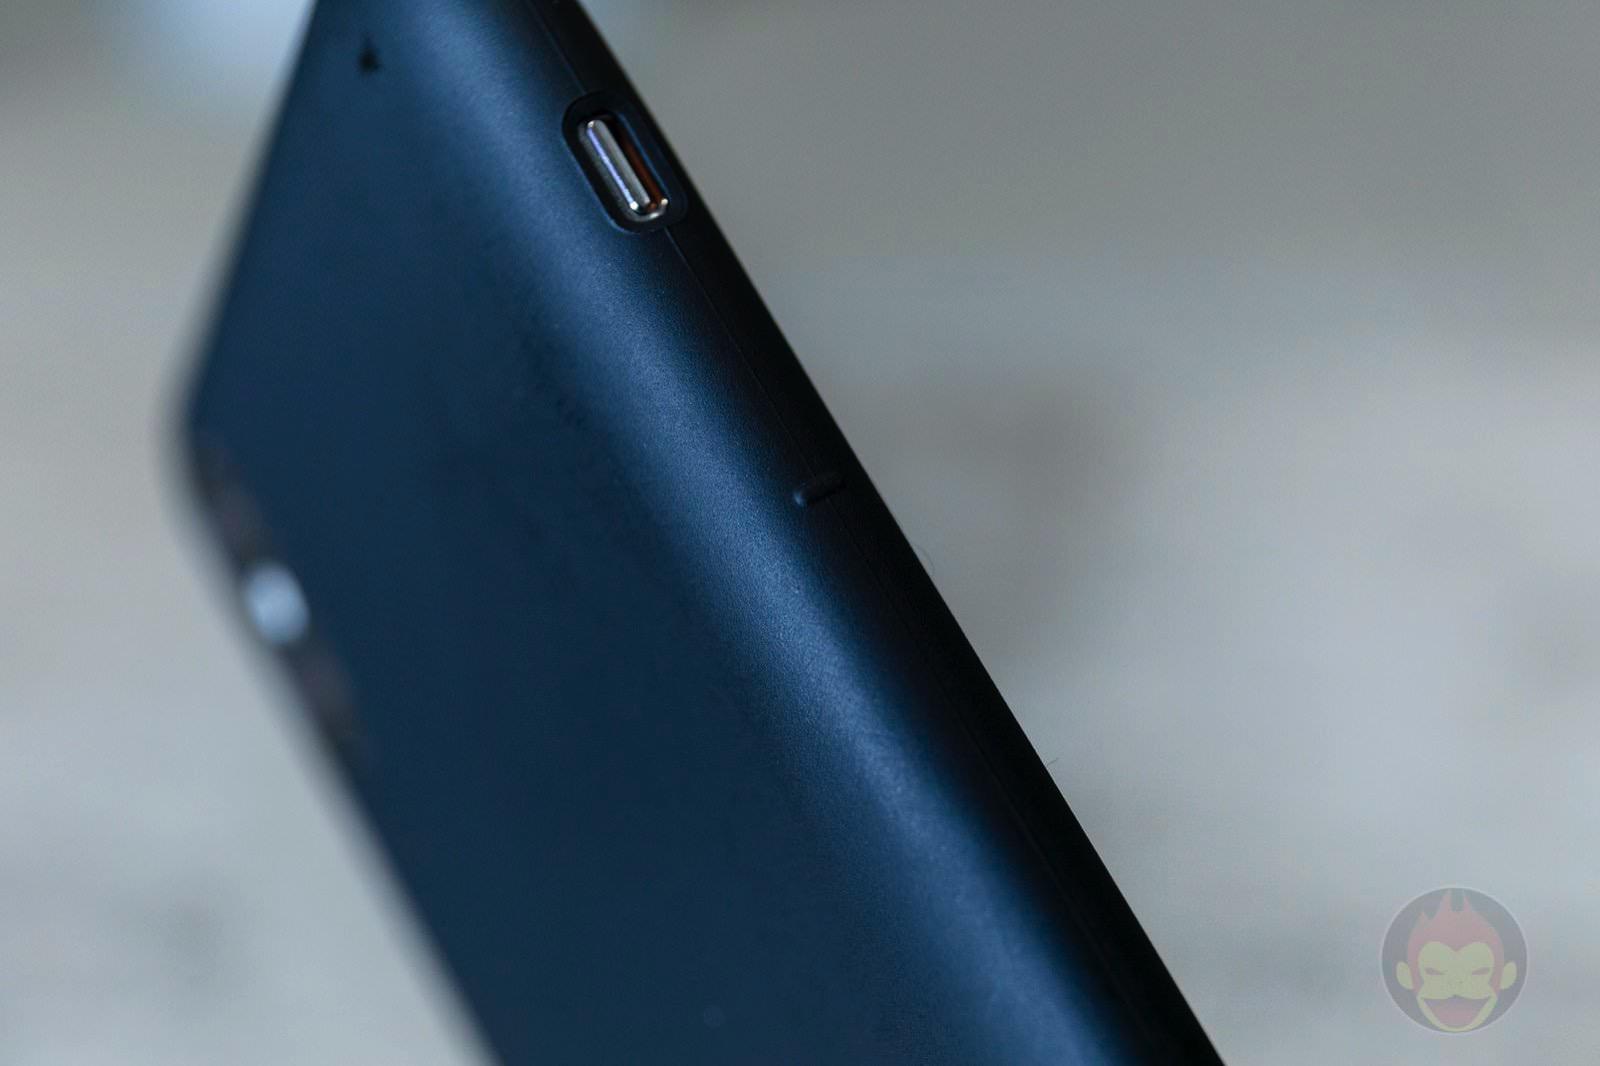 MYNUS-iPhone-XS-Case-Review-03.jpg